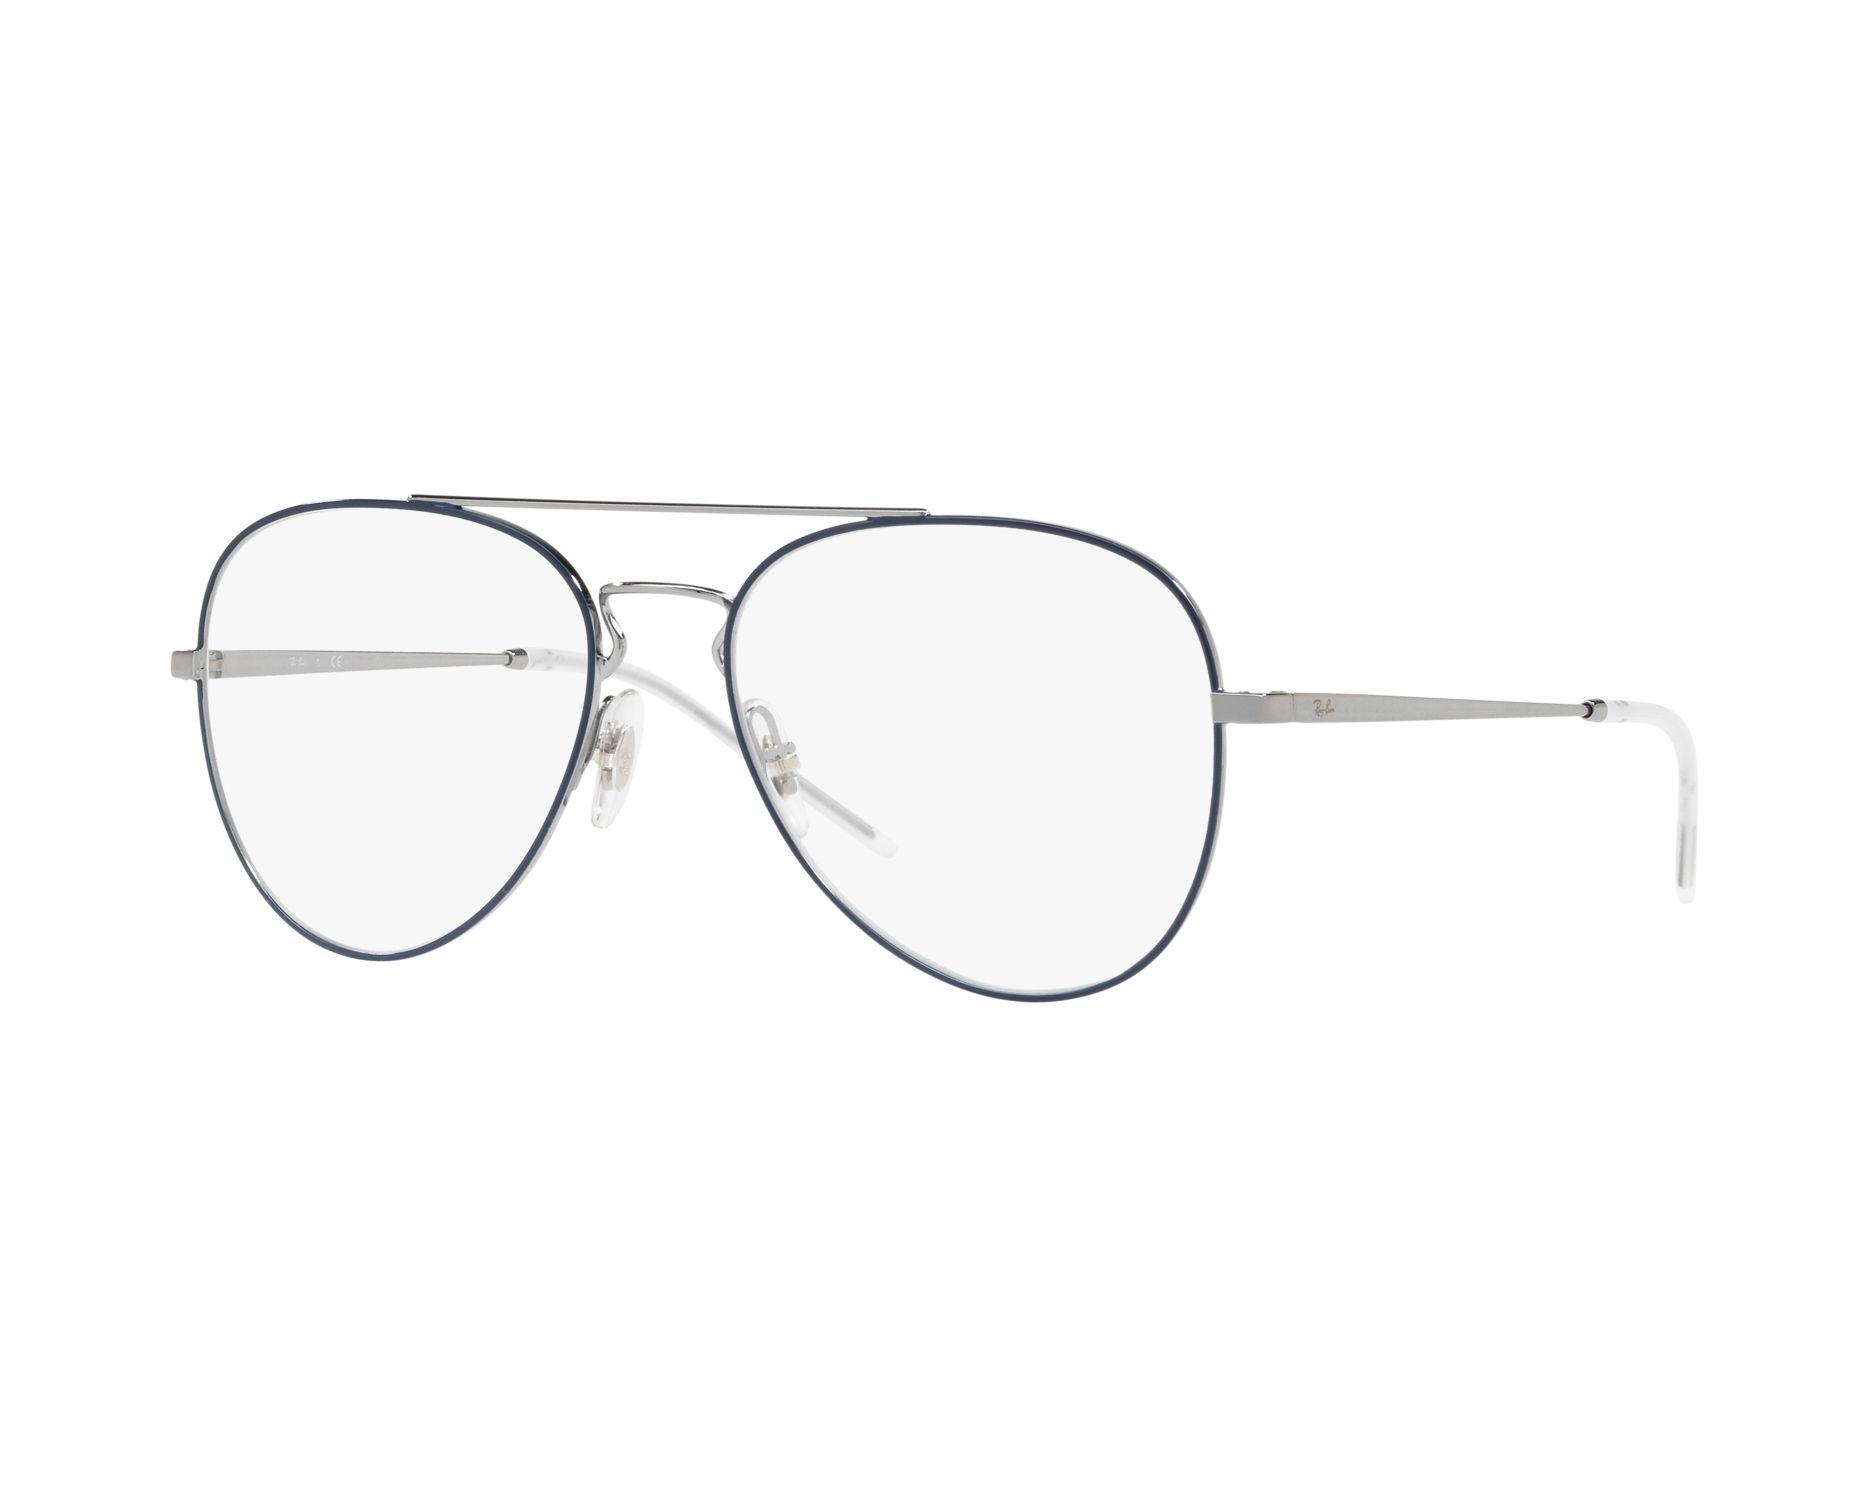 46f52210877 eyeglasses Ray-Ban RX-6413 2981 54-17 Blue Silver